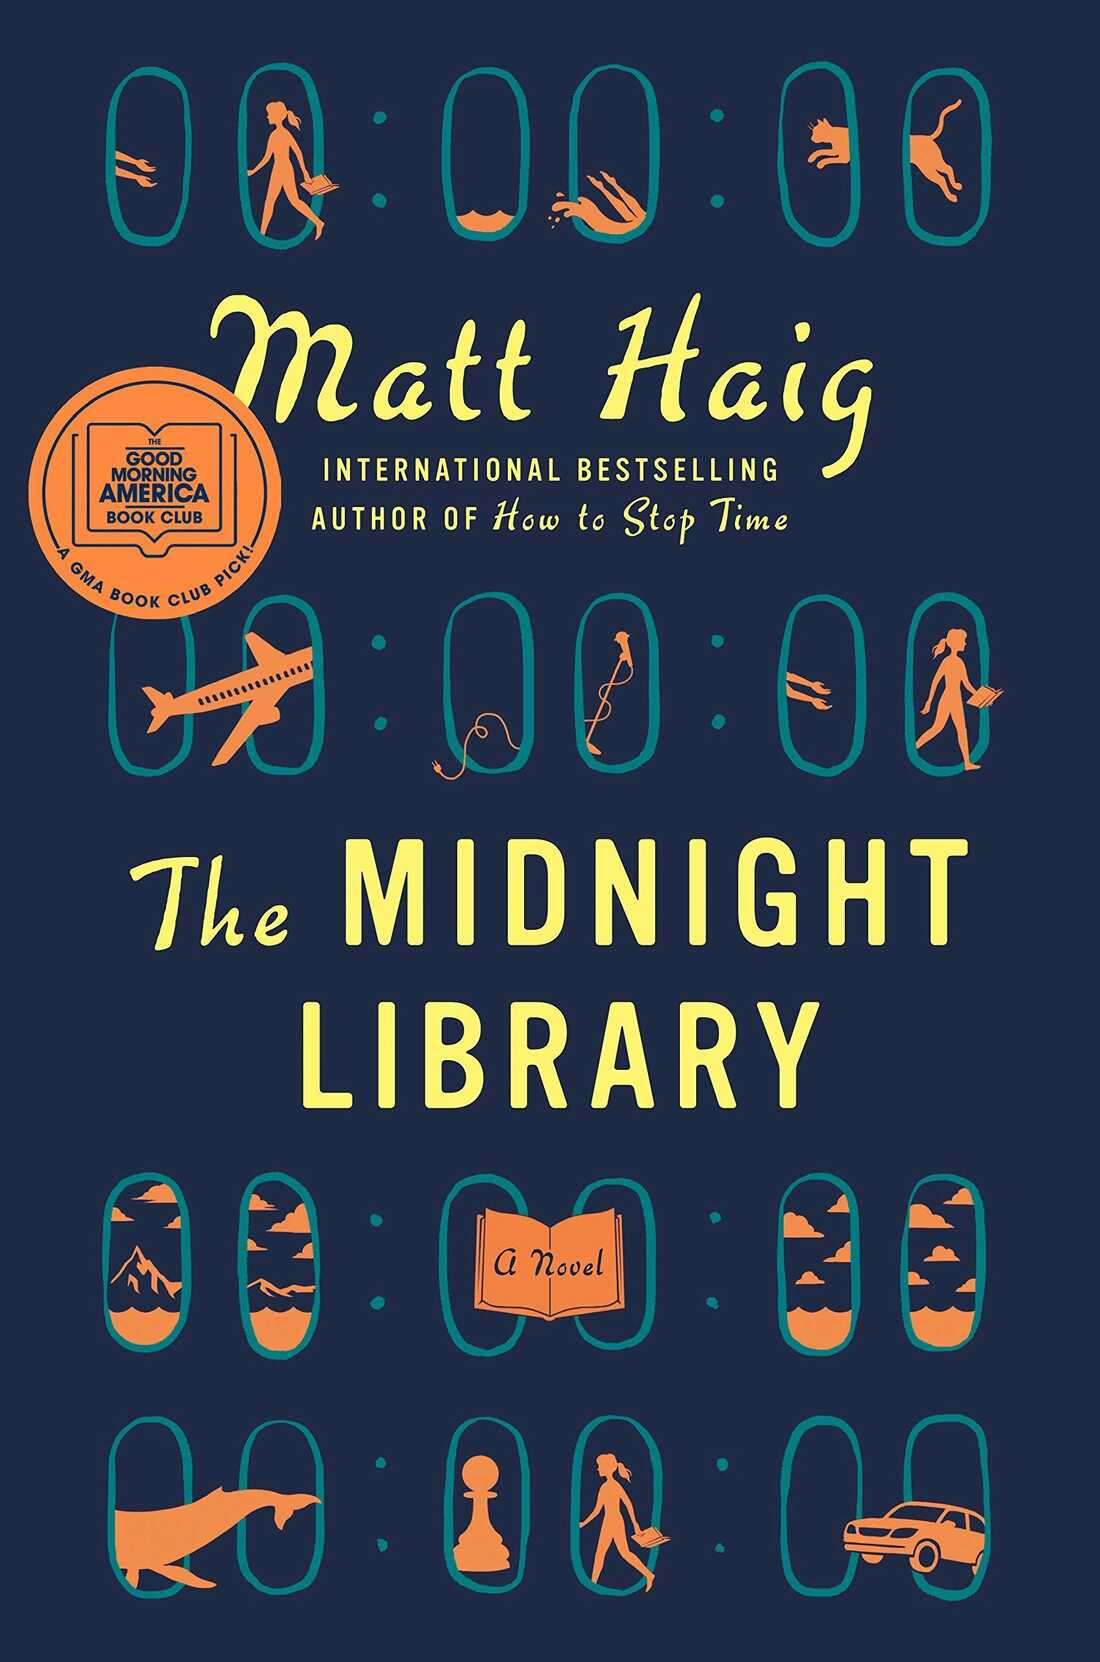 The Midnight Library, by Matt Haig